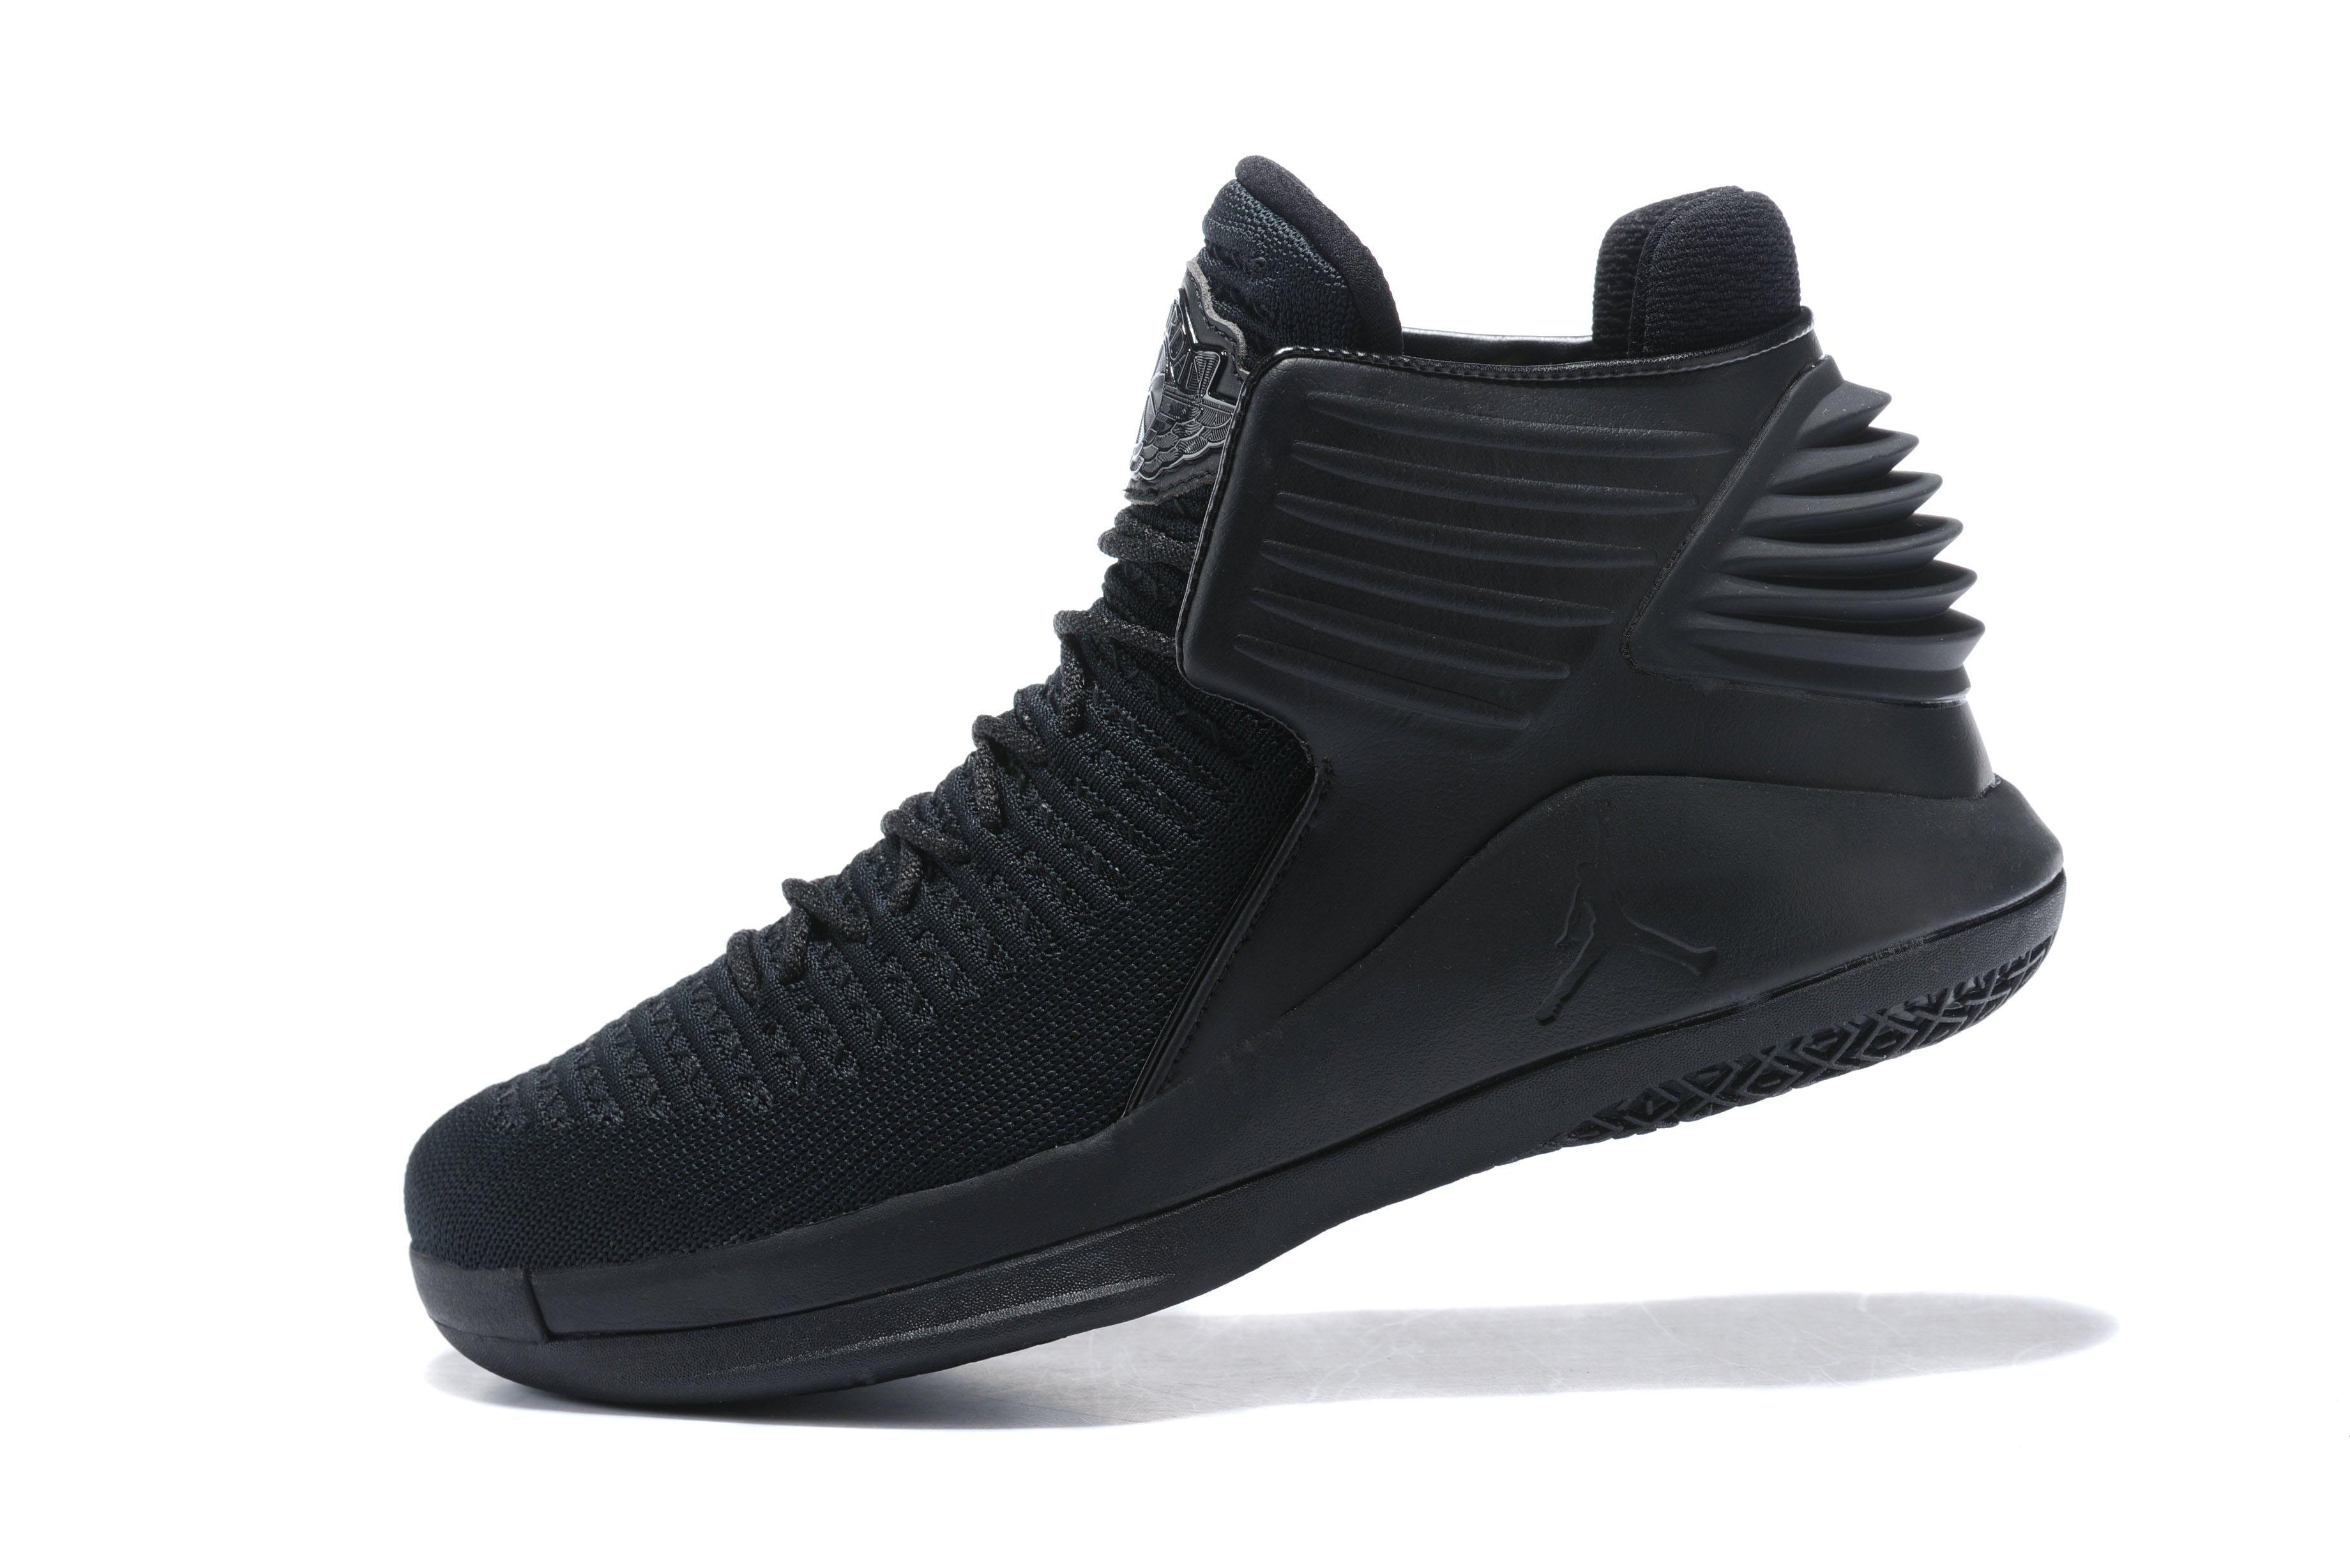 30a93844c7ac Latest Air Jordan 32 Triple Black Men s Basketball Shoes